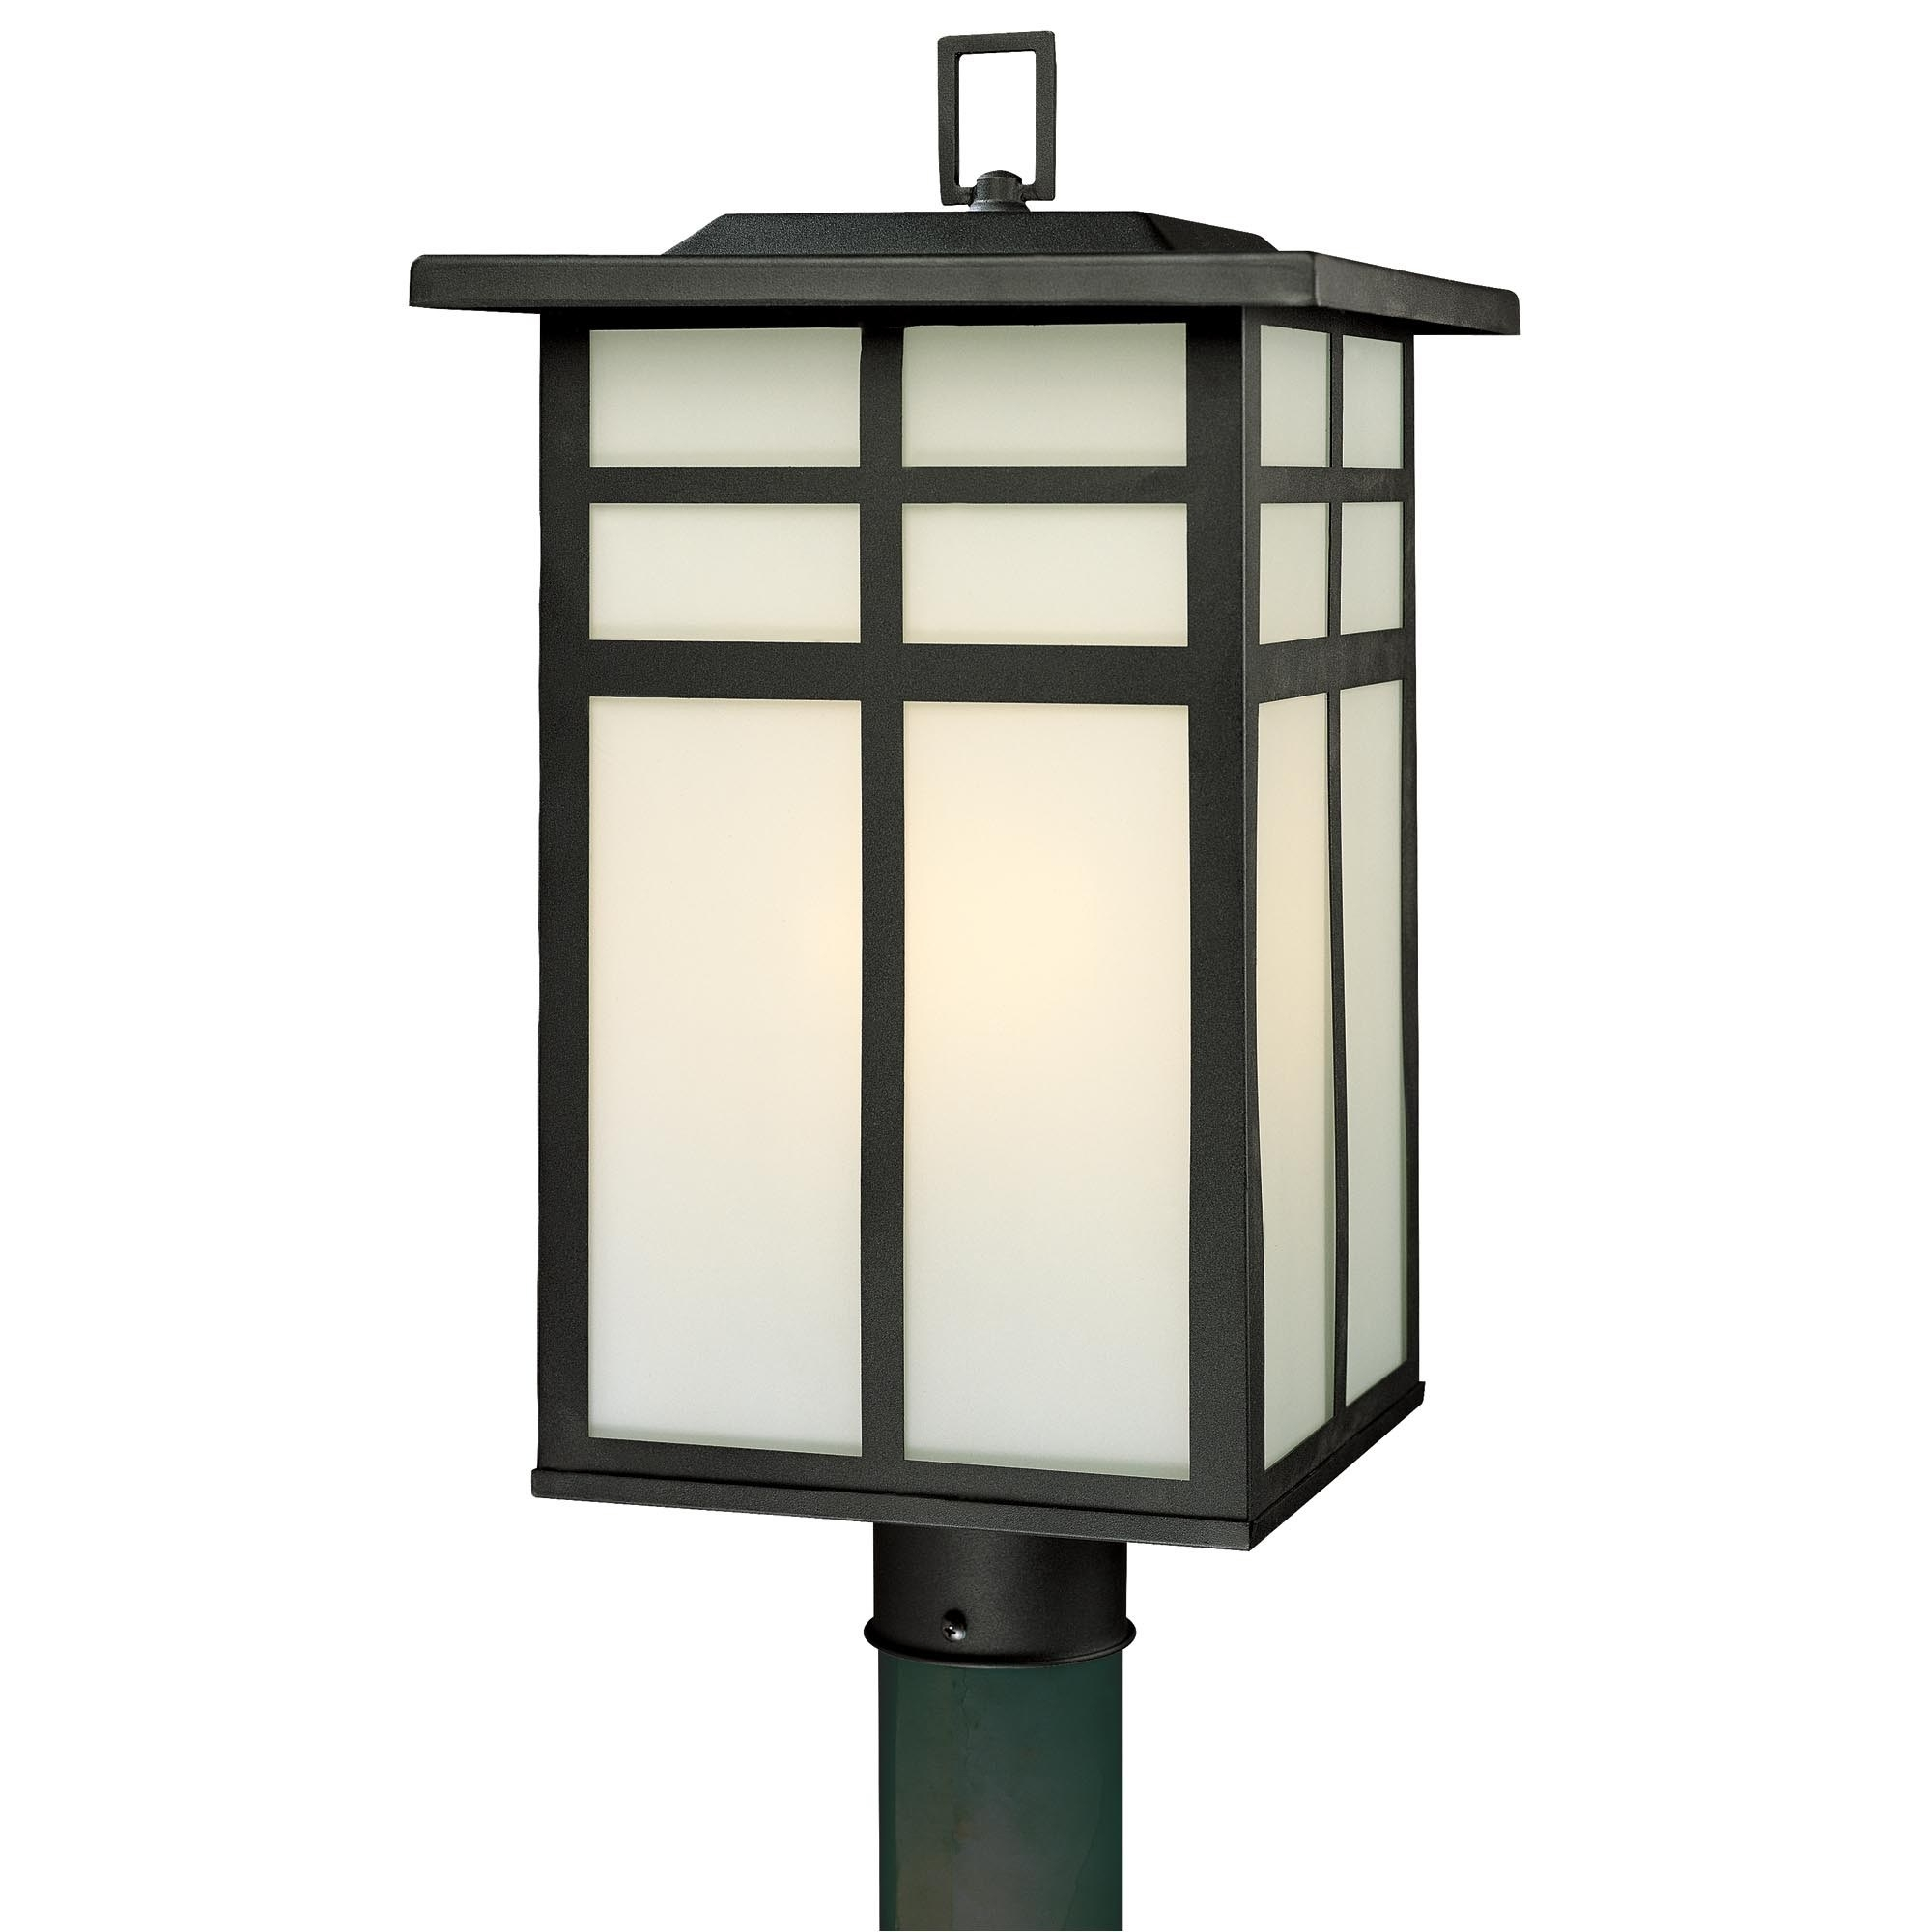 Outdoor Lamps Solar Lights Online Lantern Lowes Powered Table Door regarding Outdoor Lamp Lanterns (Image 15 of 20)